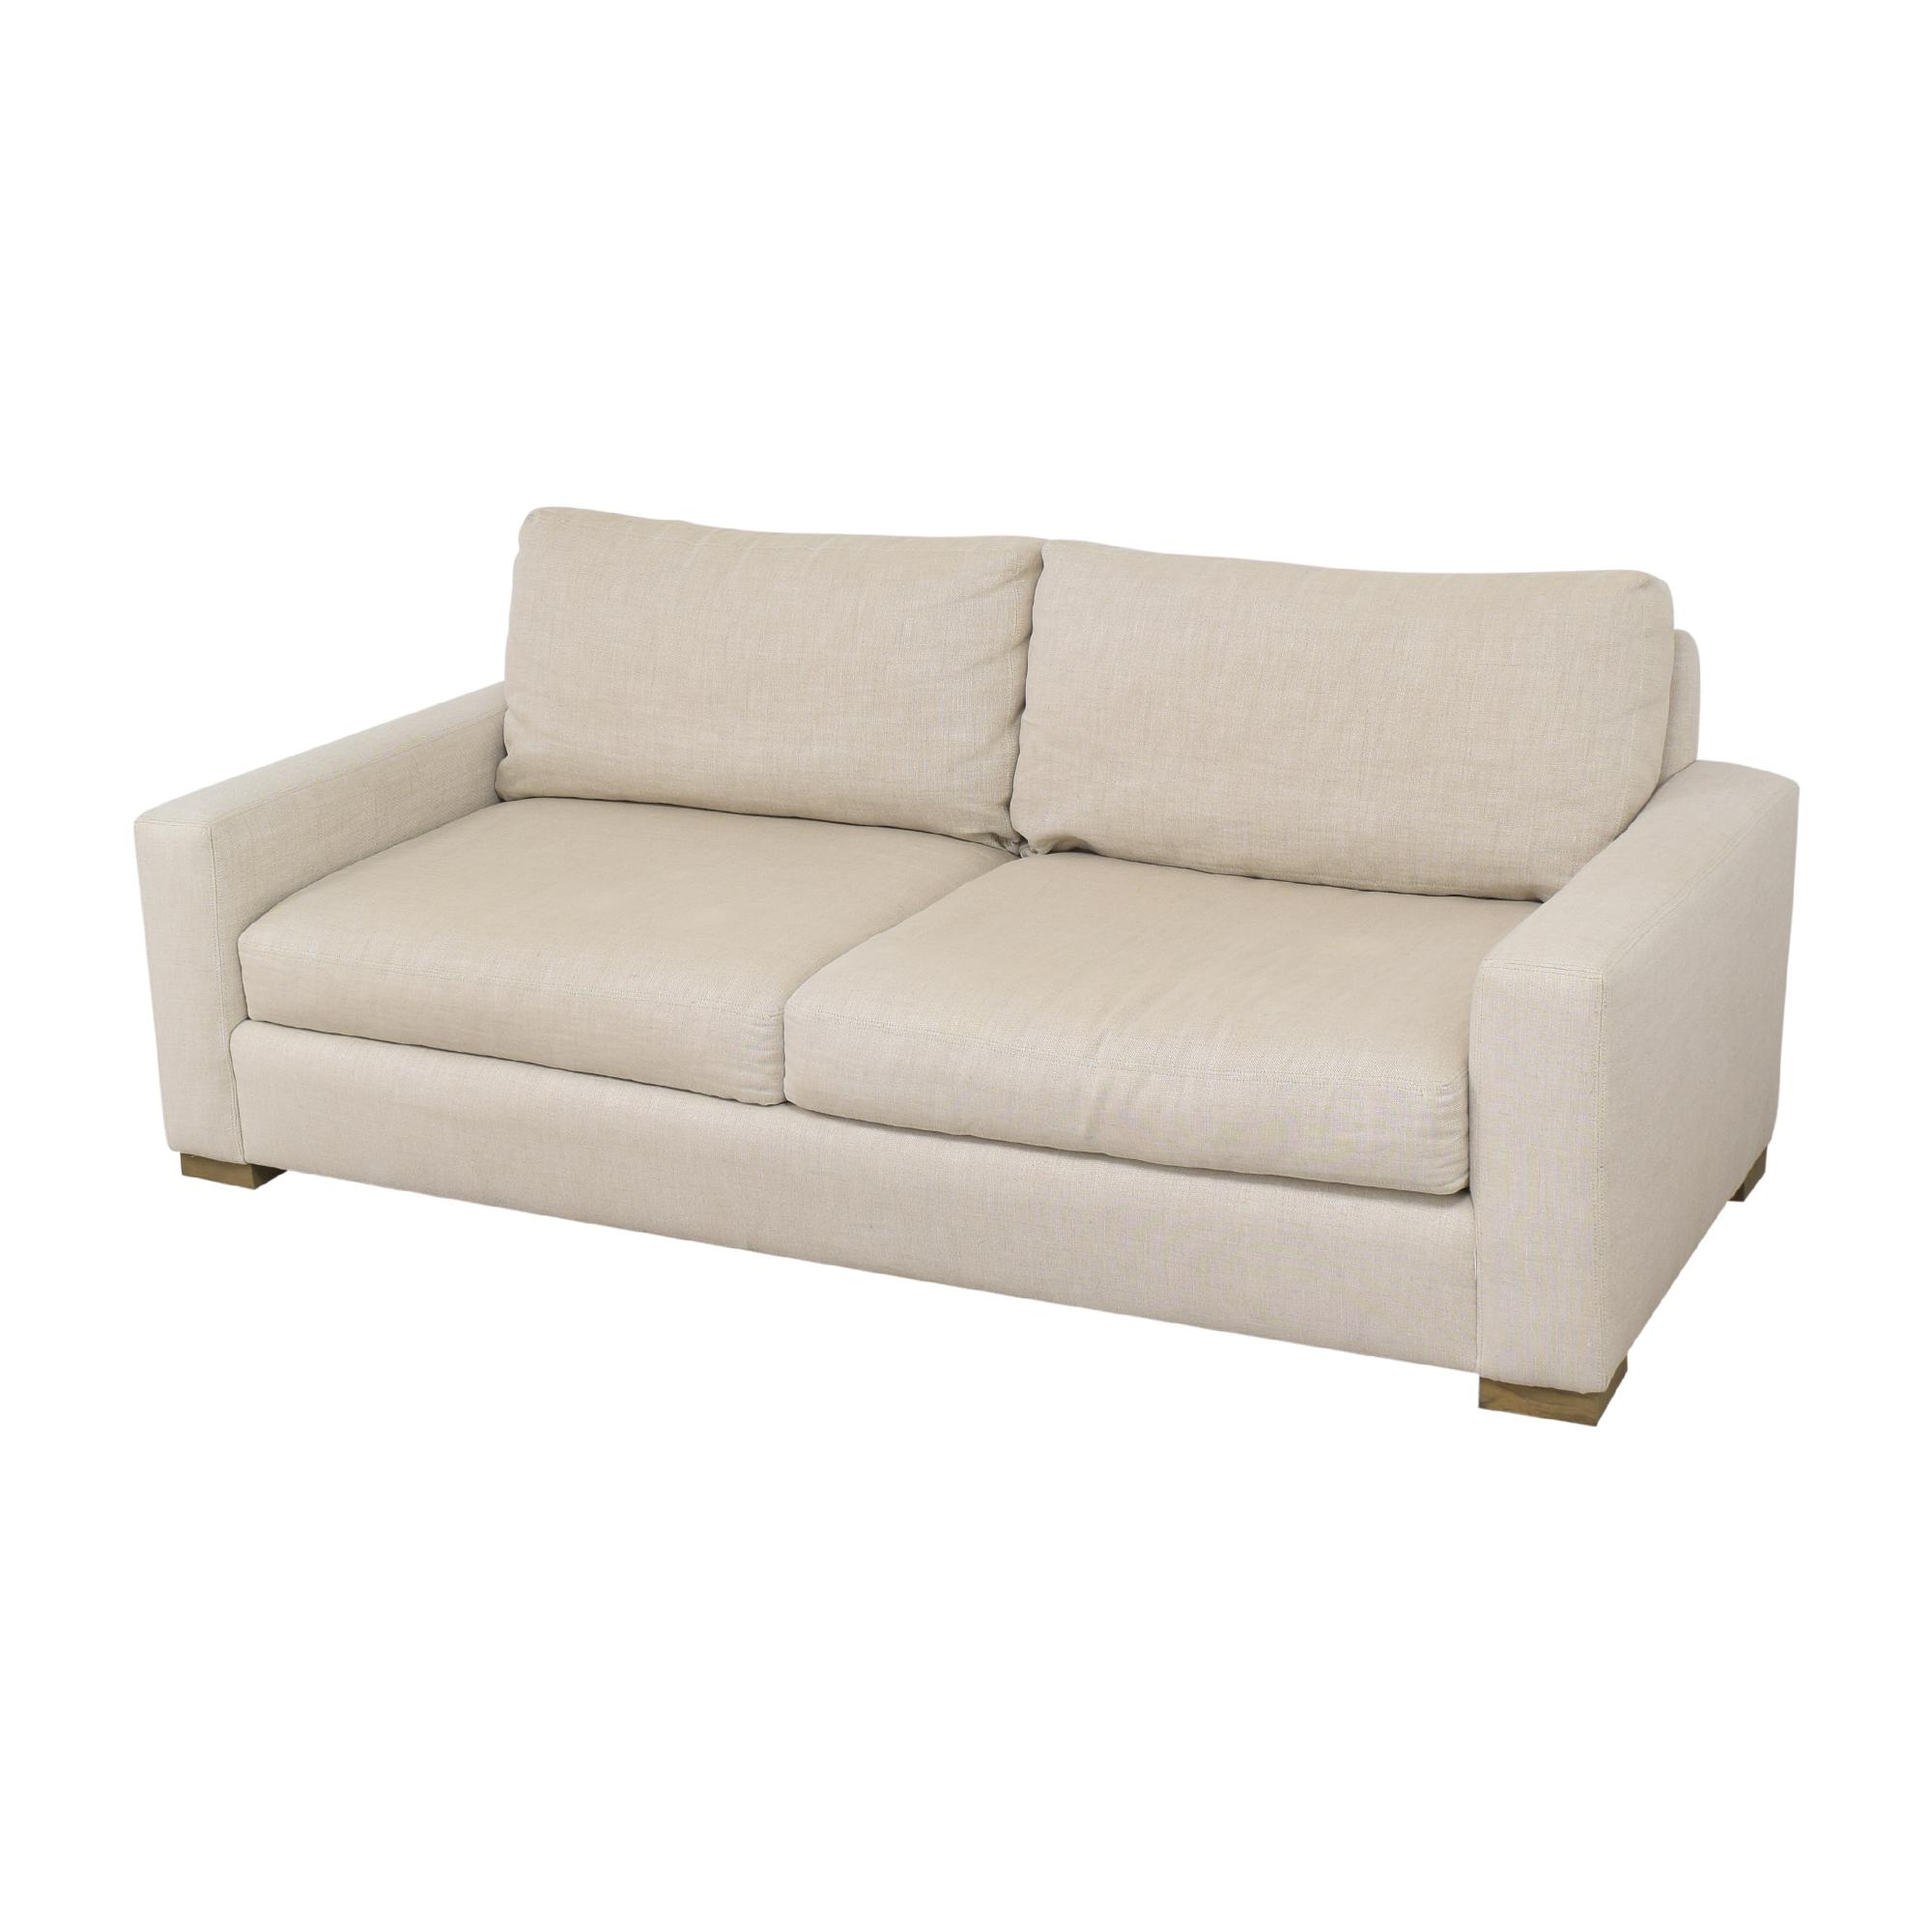 buy Restoration Hardware Two Cushion Sofa Restoration Hardware